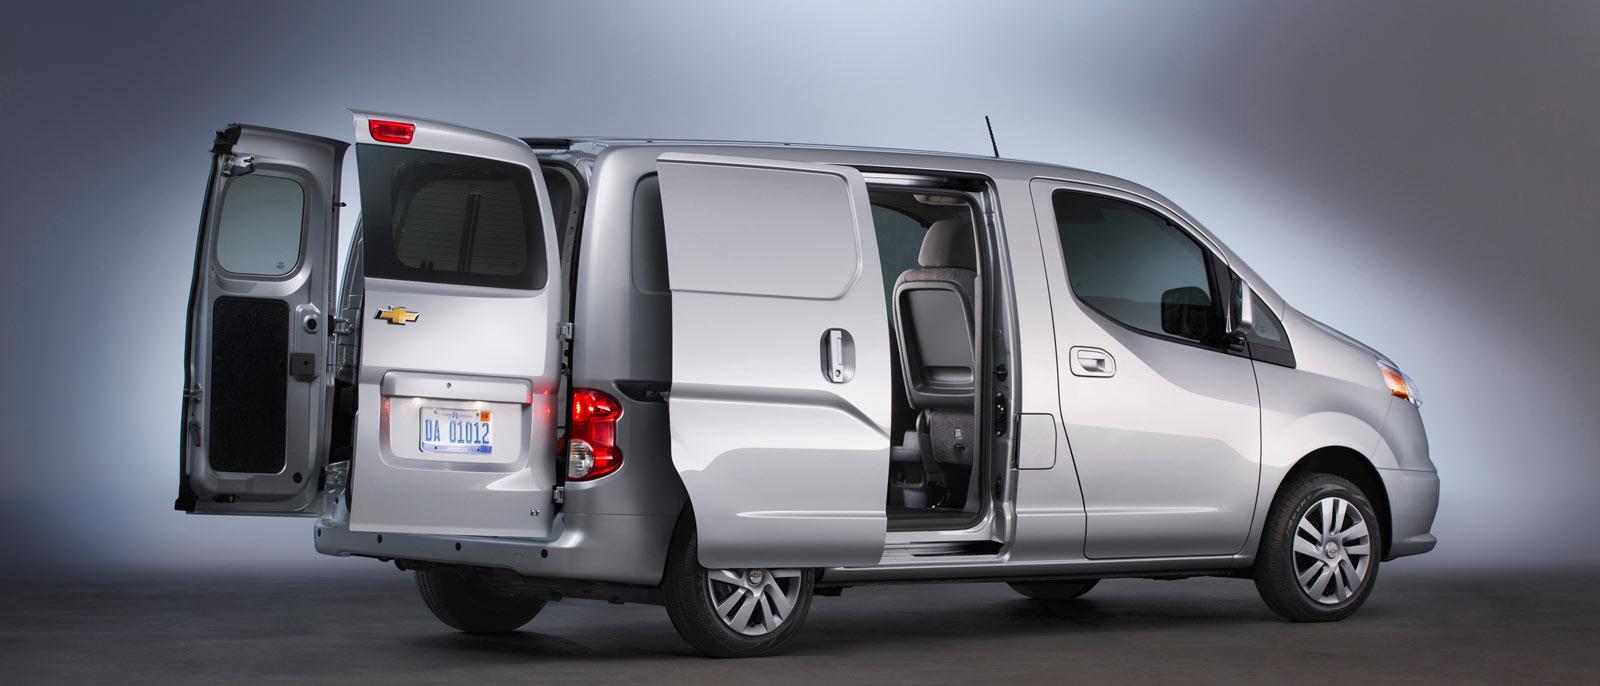 2016 Chevrolet City Express Cargo Van | Mike Anderson Chevrolet